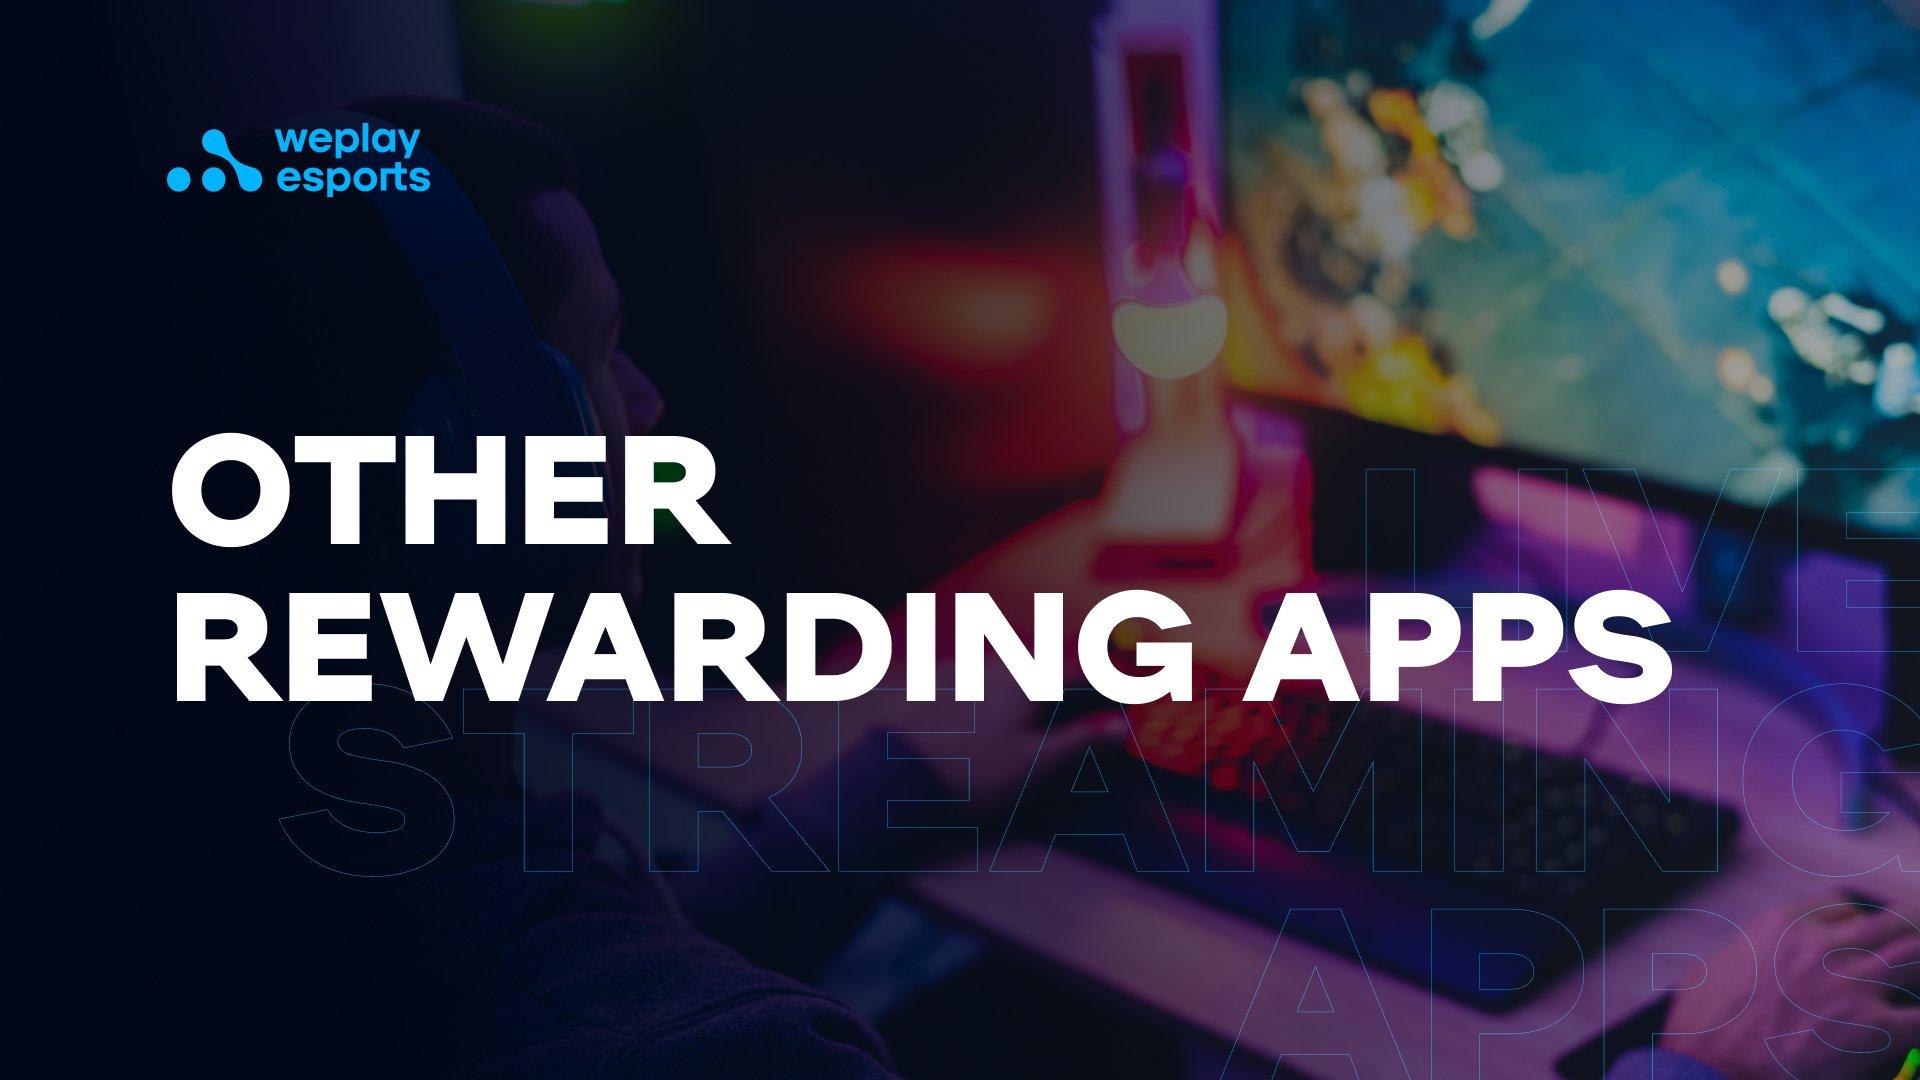 Other rewarding apps